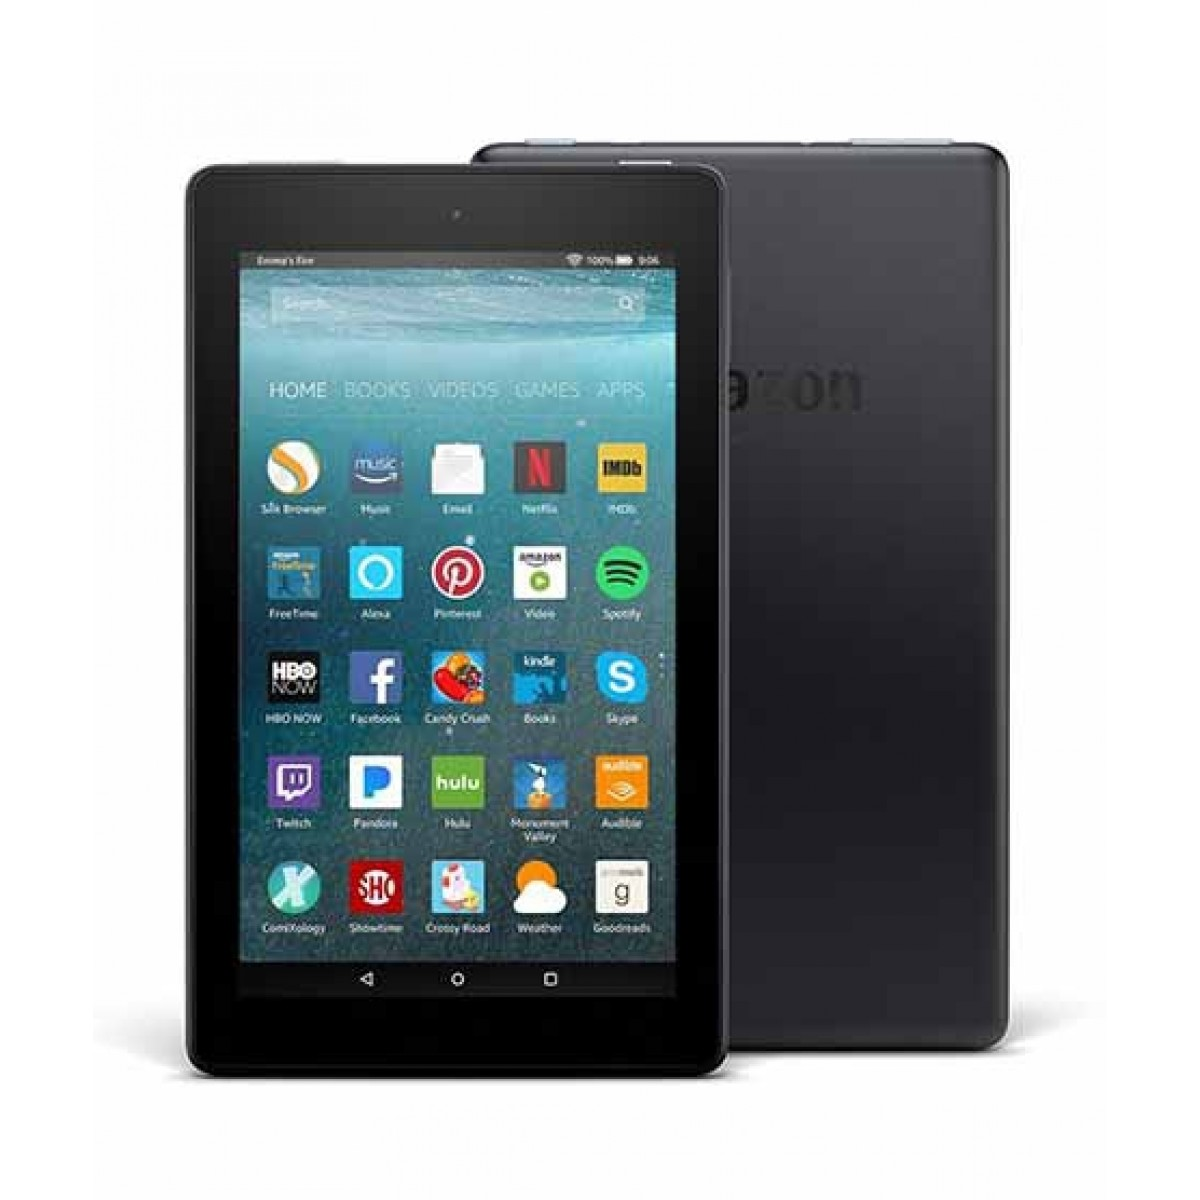 Amazon Fire 7 Tablet Price In Pakistan Buy Amazon Fire 7